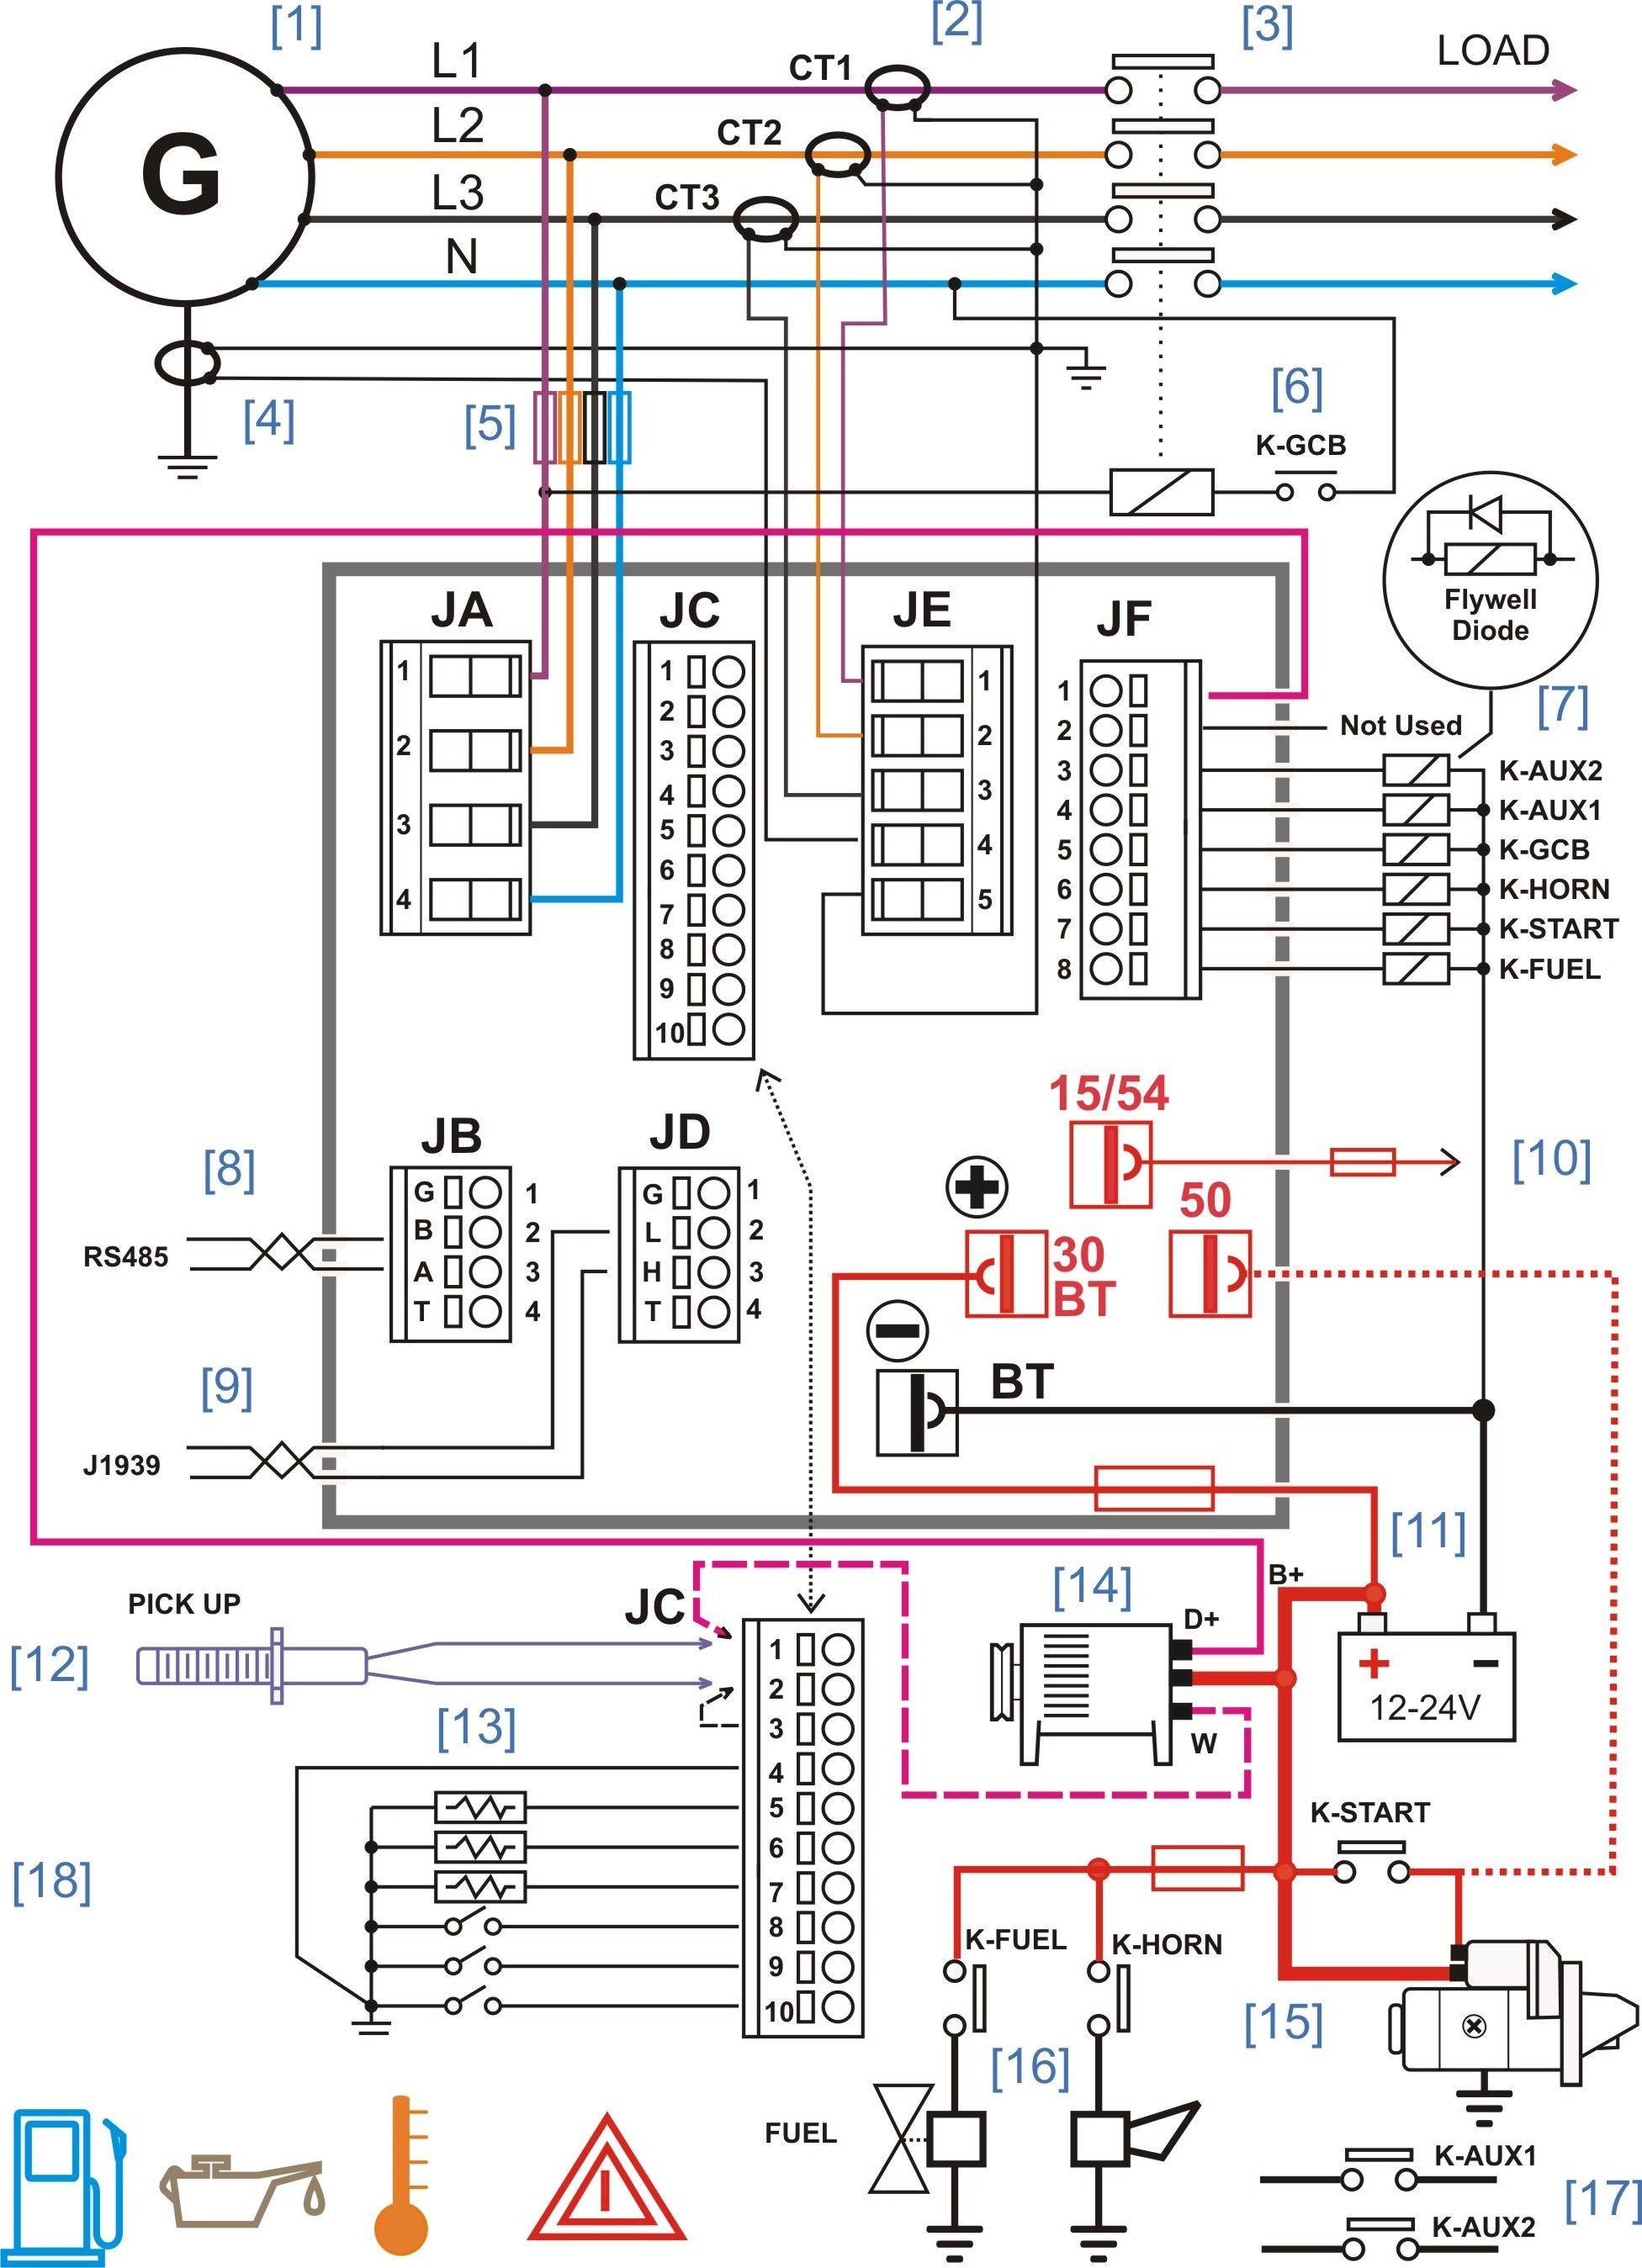 Wiring Diagram Ac Generator New Wiring Diagram Ac Save Diesel Generator Control Panel Wiring